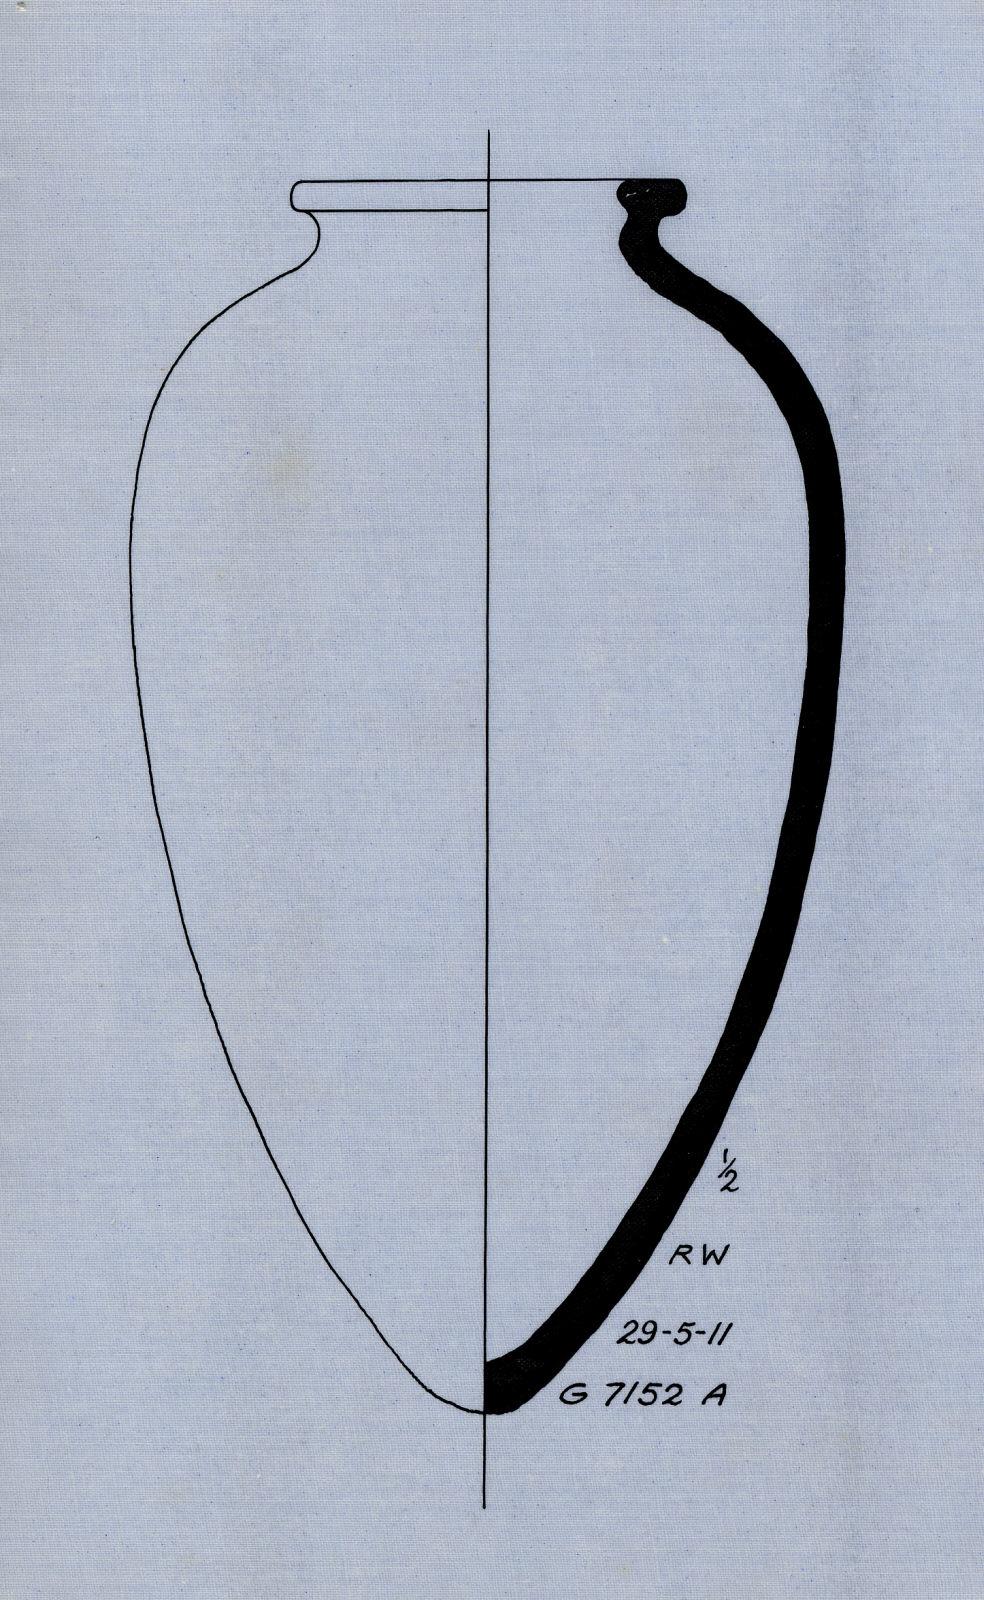 Drawings: G 7152, Shaft A: pottery, jar